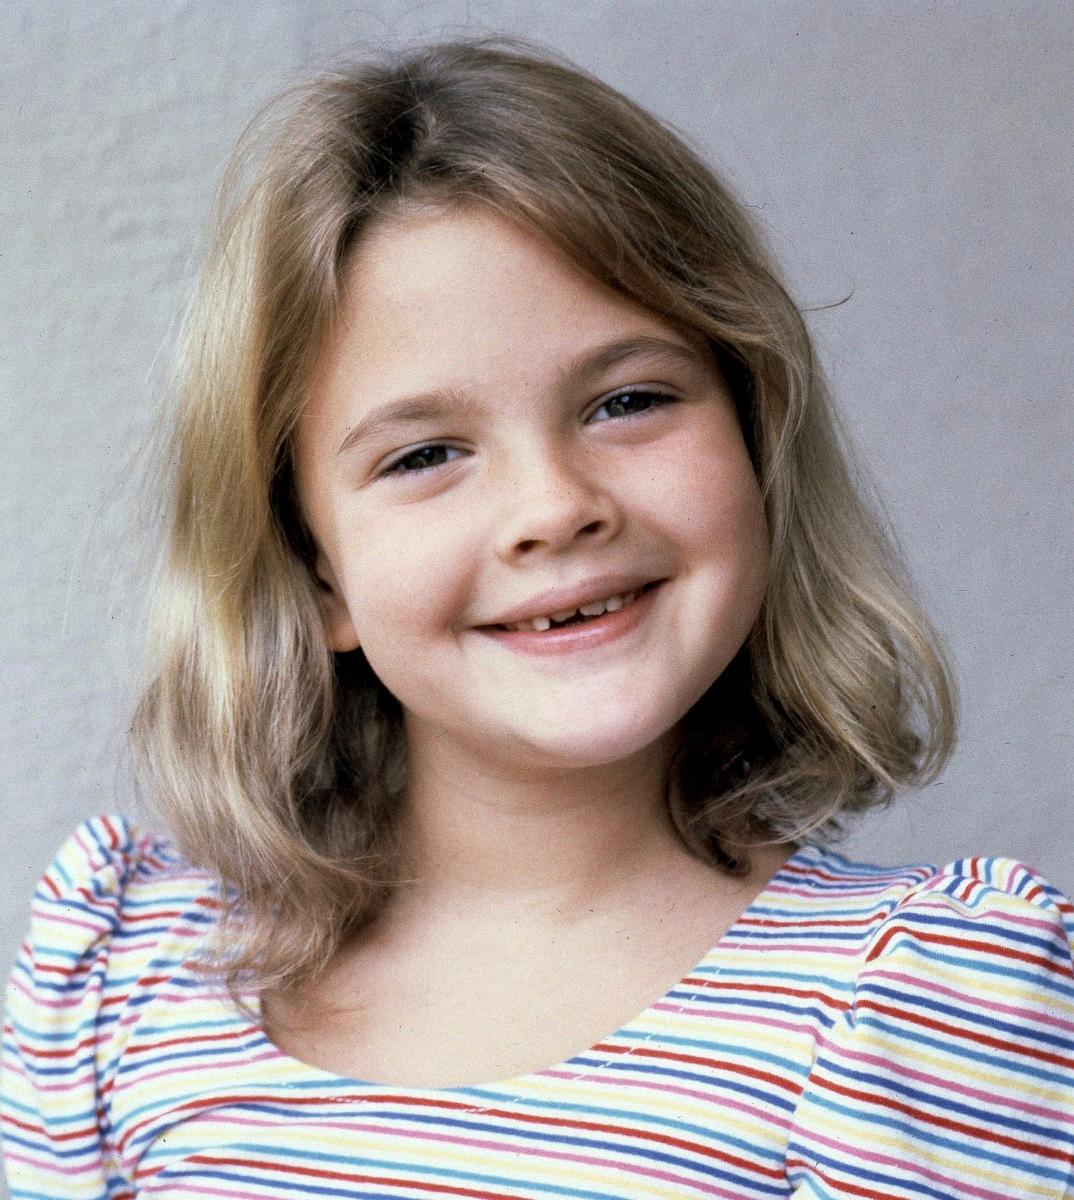 Top 10 Child Stars Gone Bad - Listverse